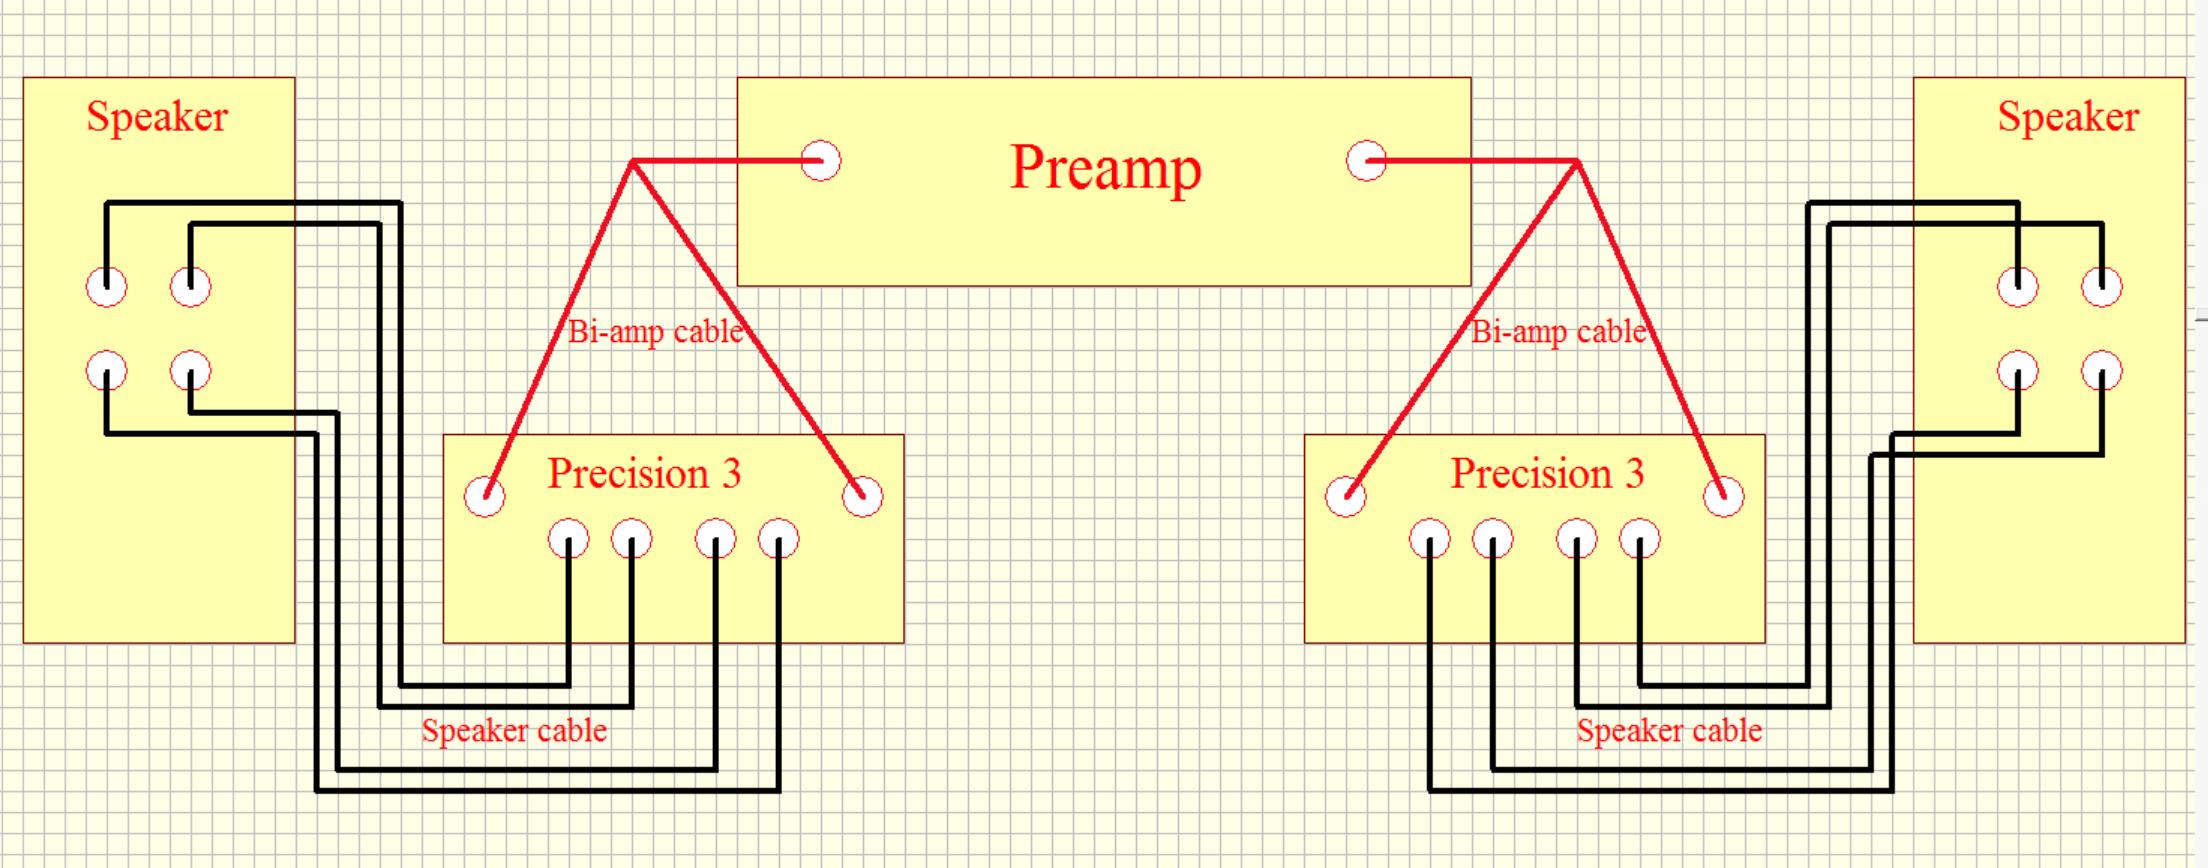 AUDIO-GD BI-AMP ACSS Modulation Cable Female for Precision 3 1m ...